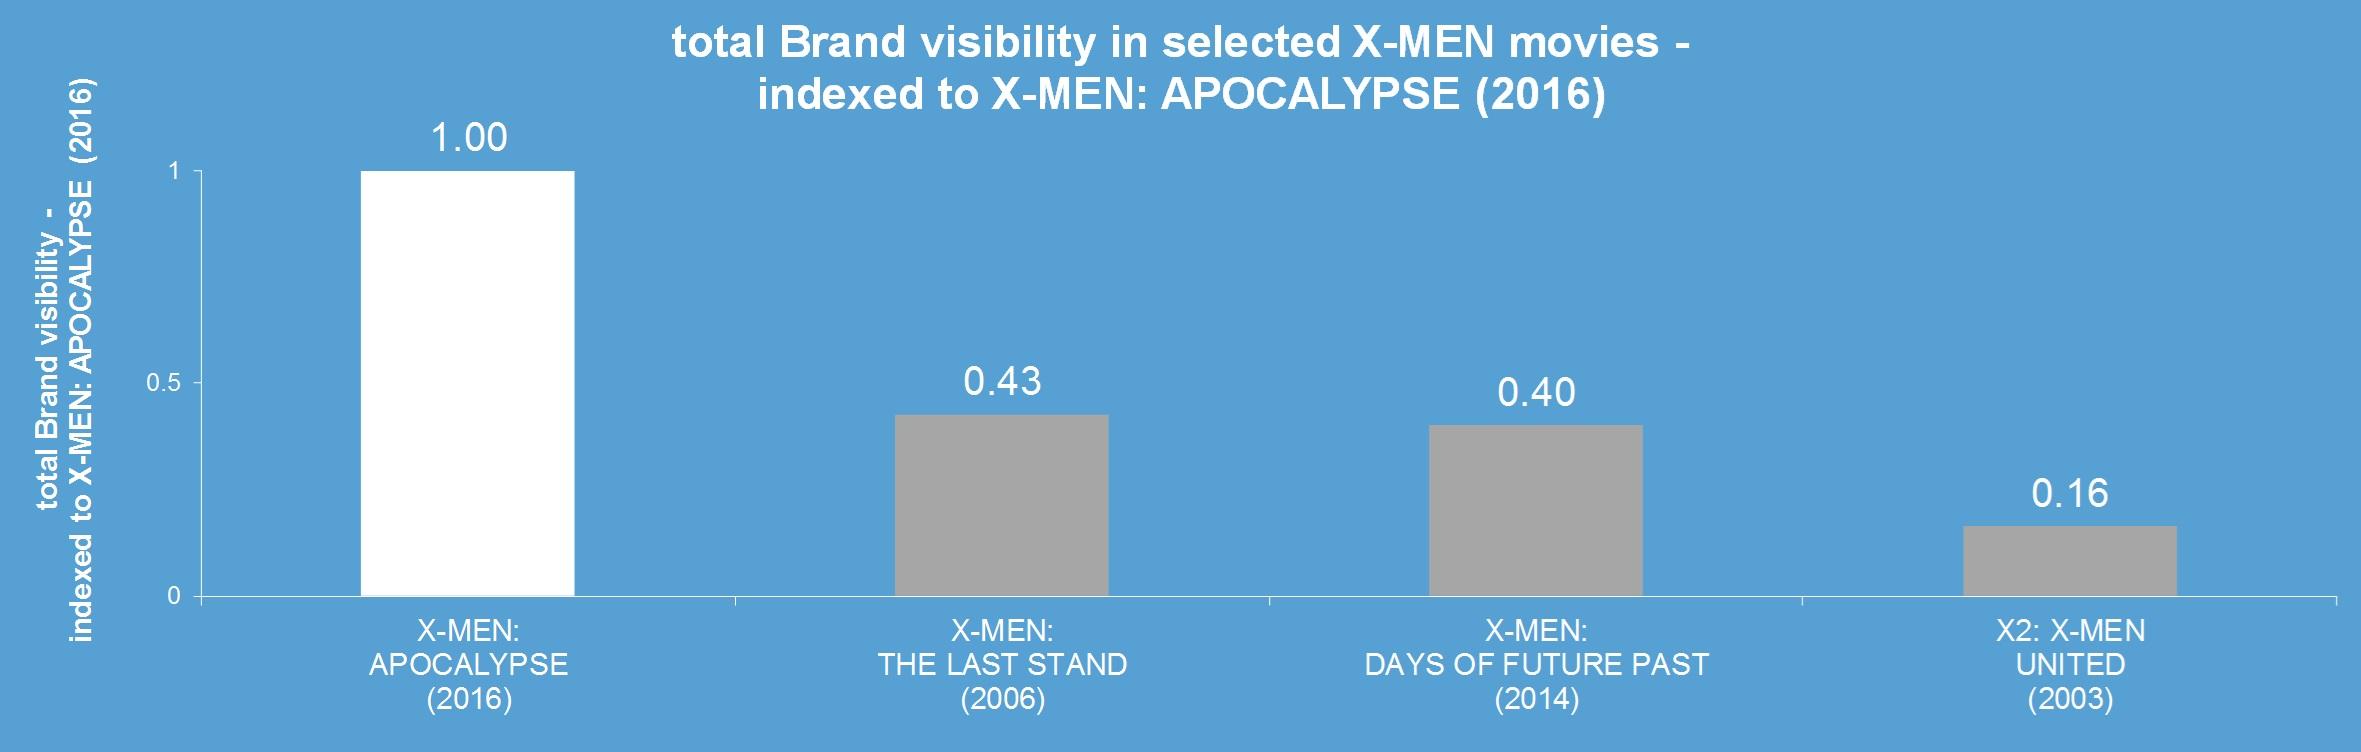 xmen movies x-men apocalypse brands product placement